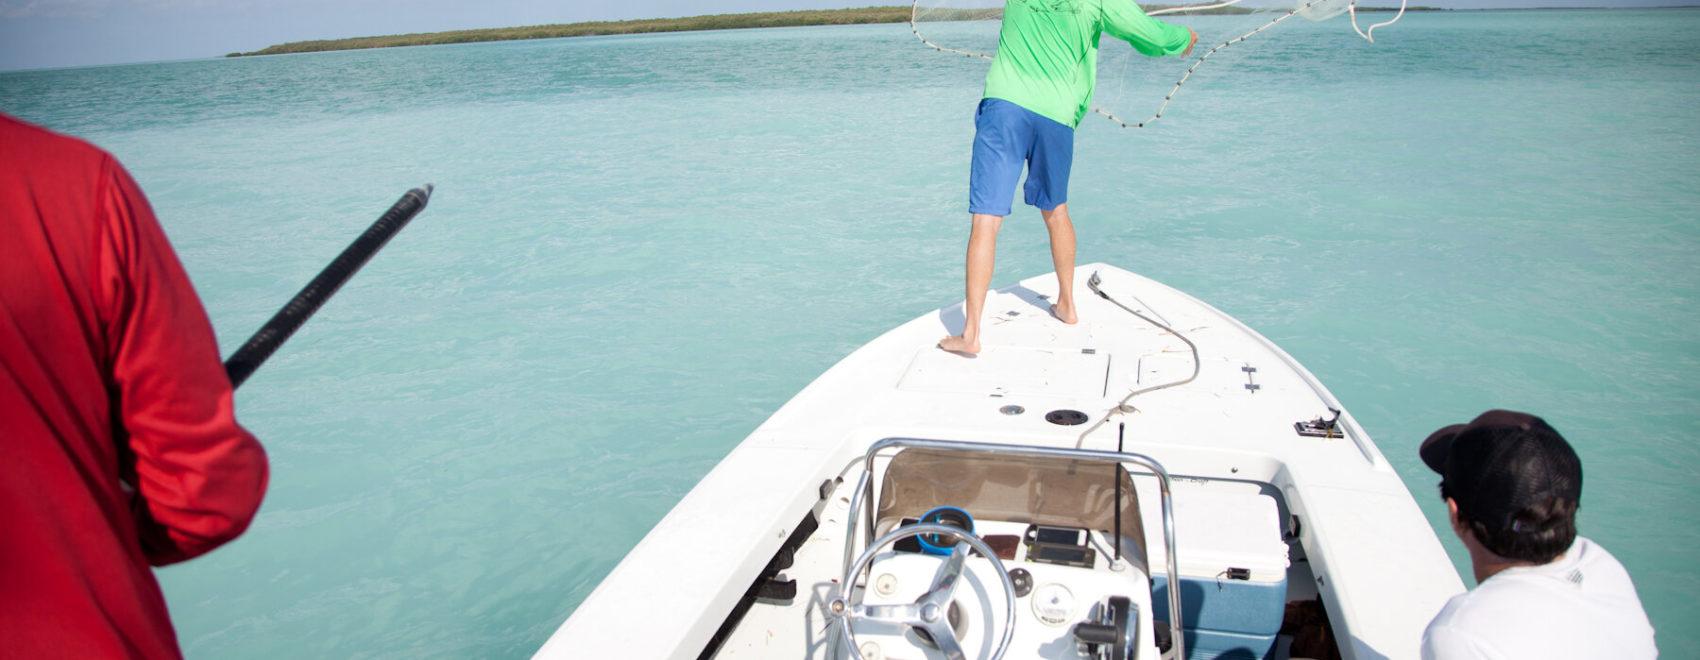 Islamorada Fishing Charters with Captain Mark Cockerham